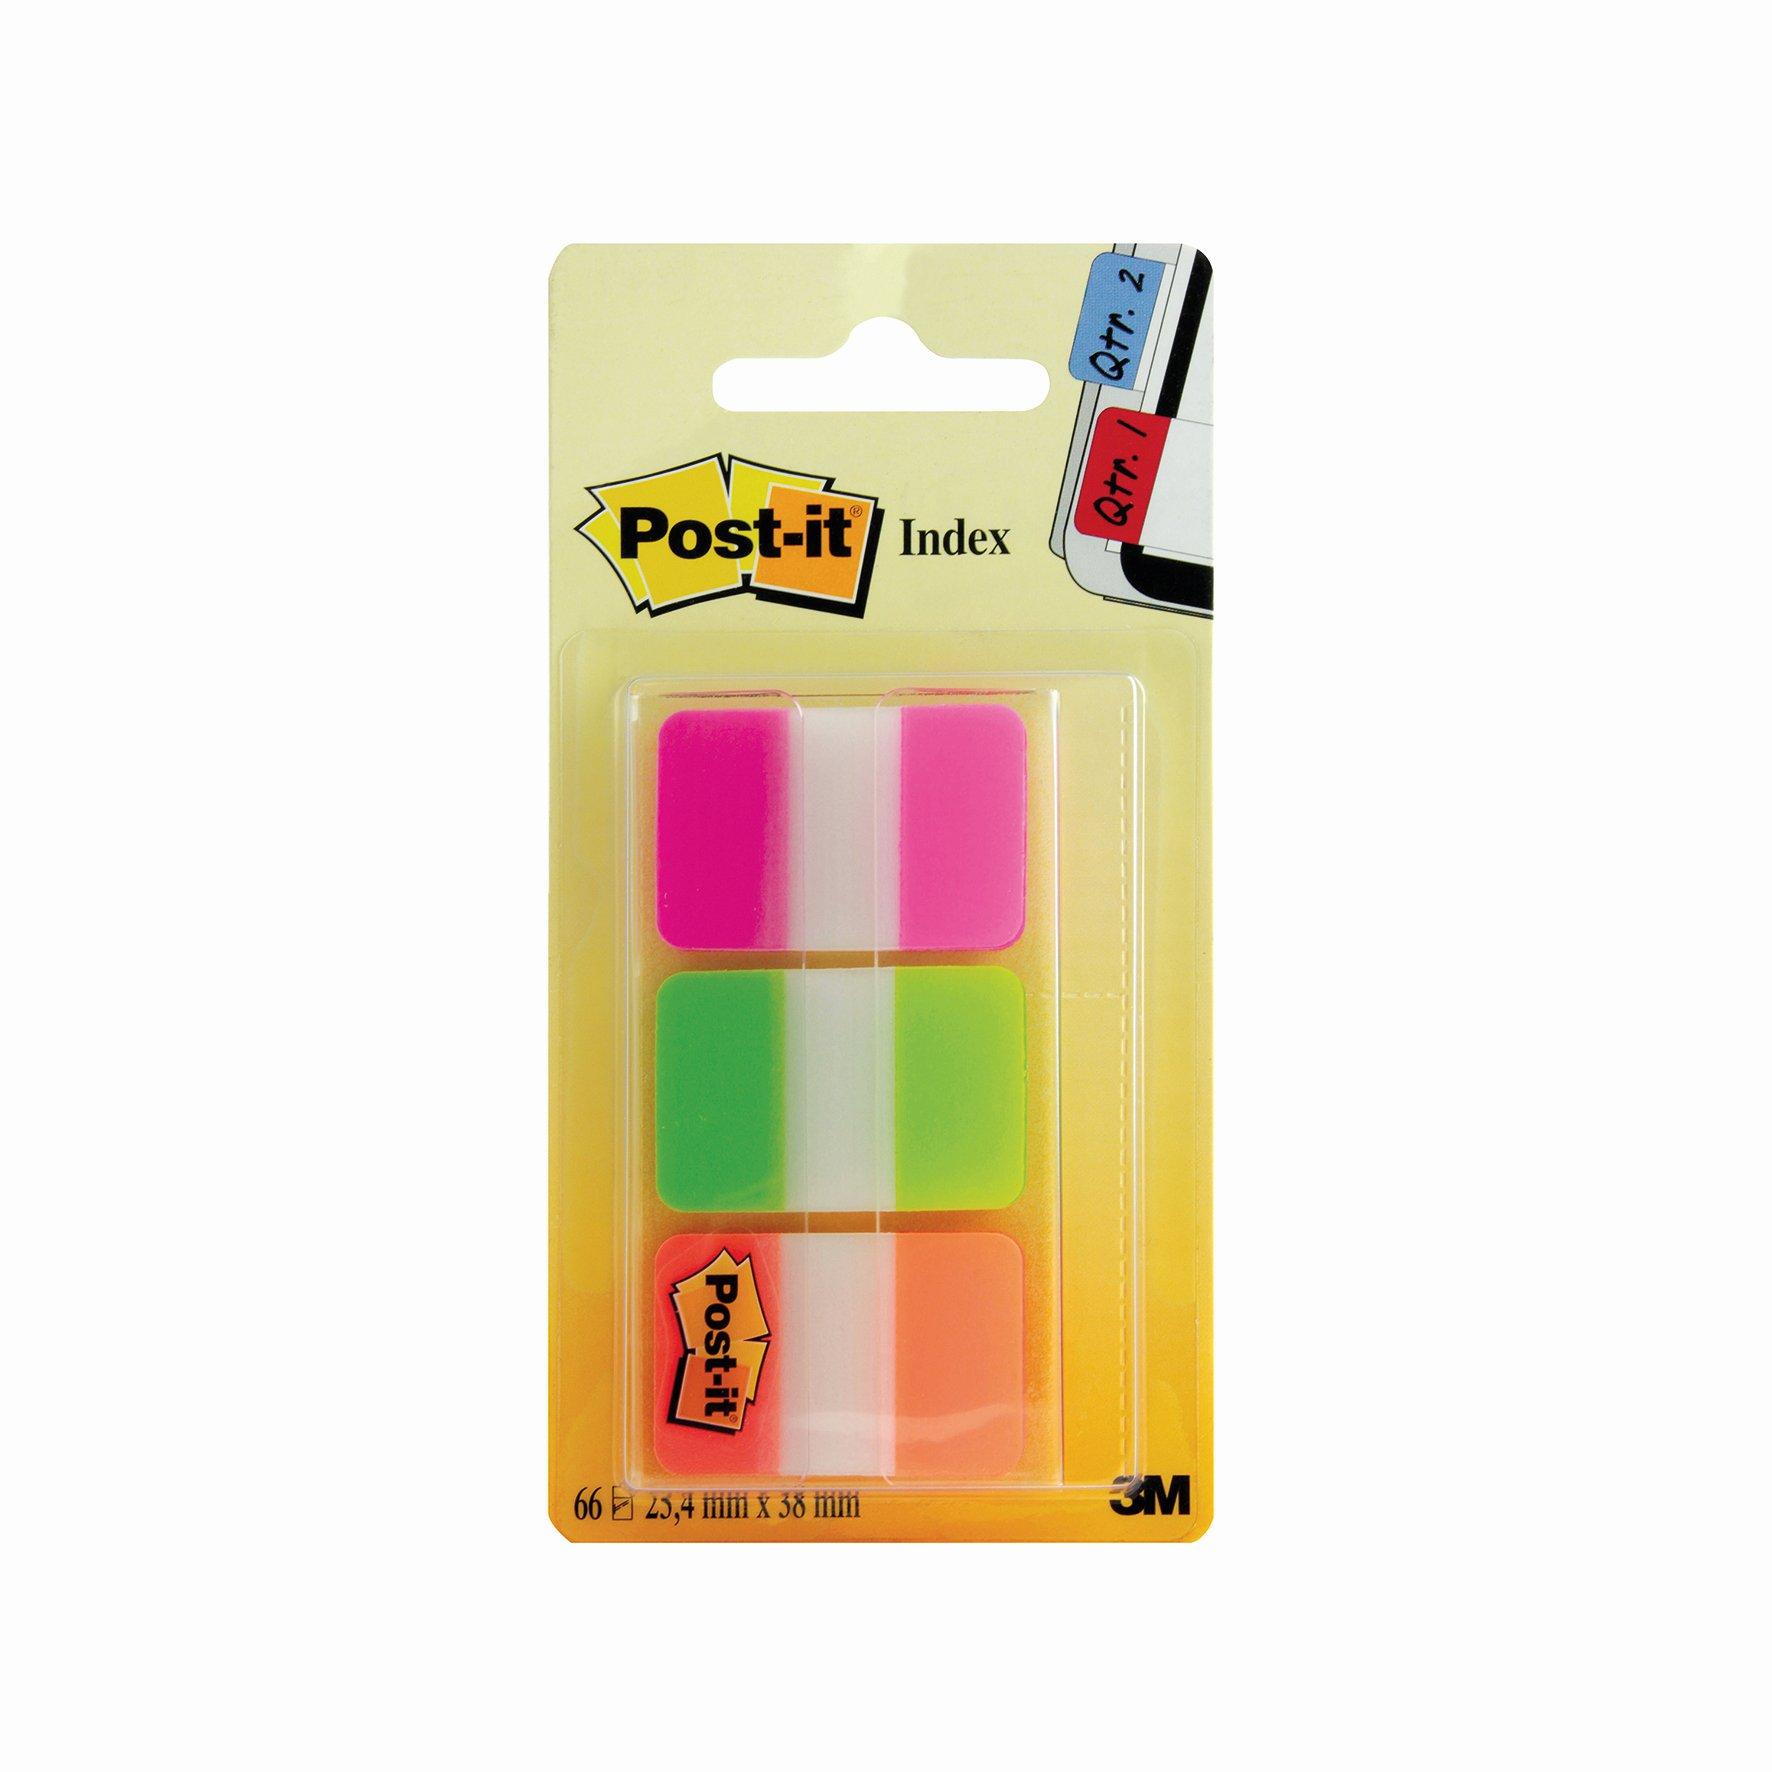 3M Post-it Strong Index Tabs 25mm Pink/Green/Orange (66) 686-PGO